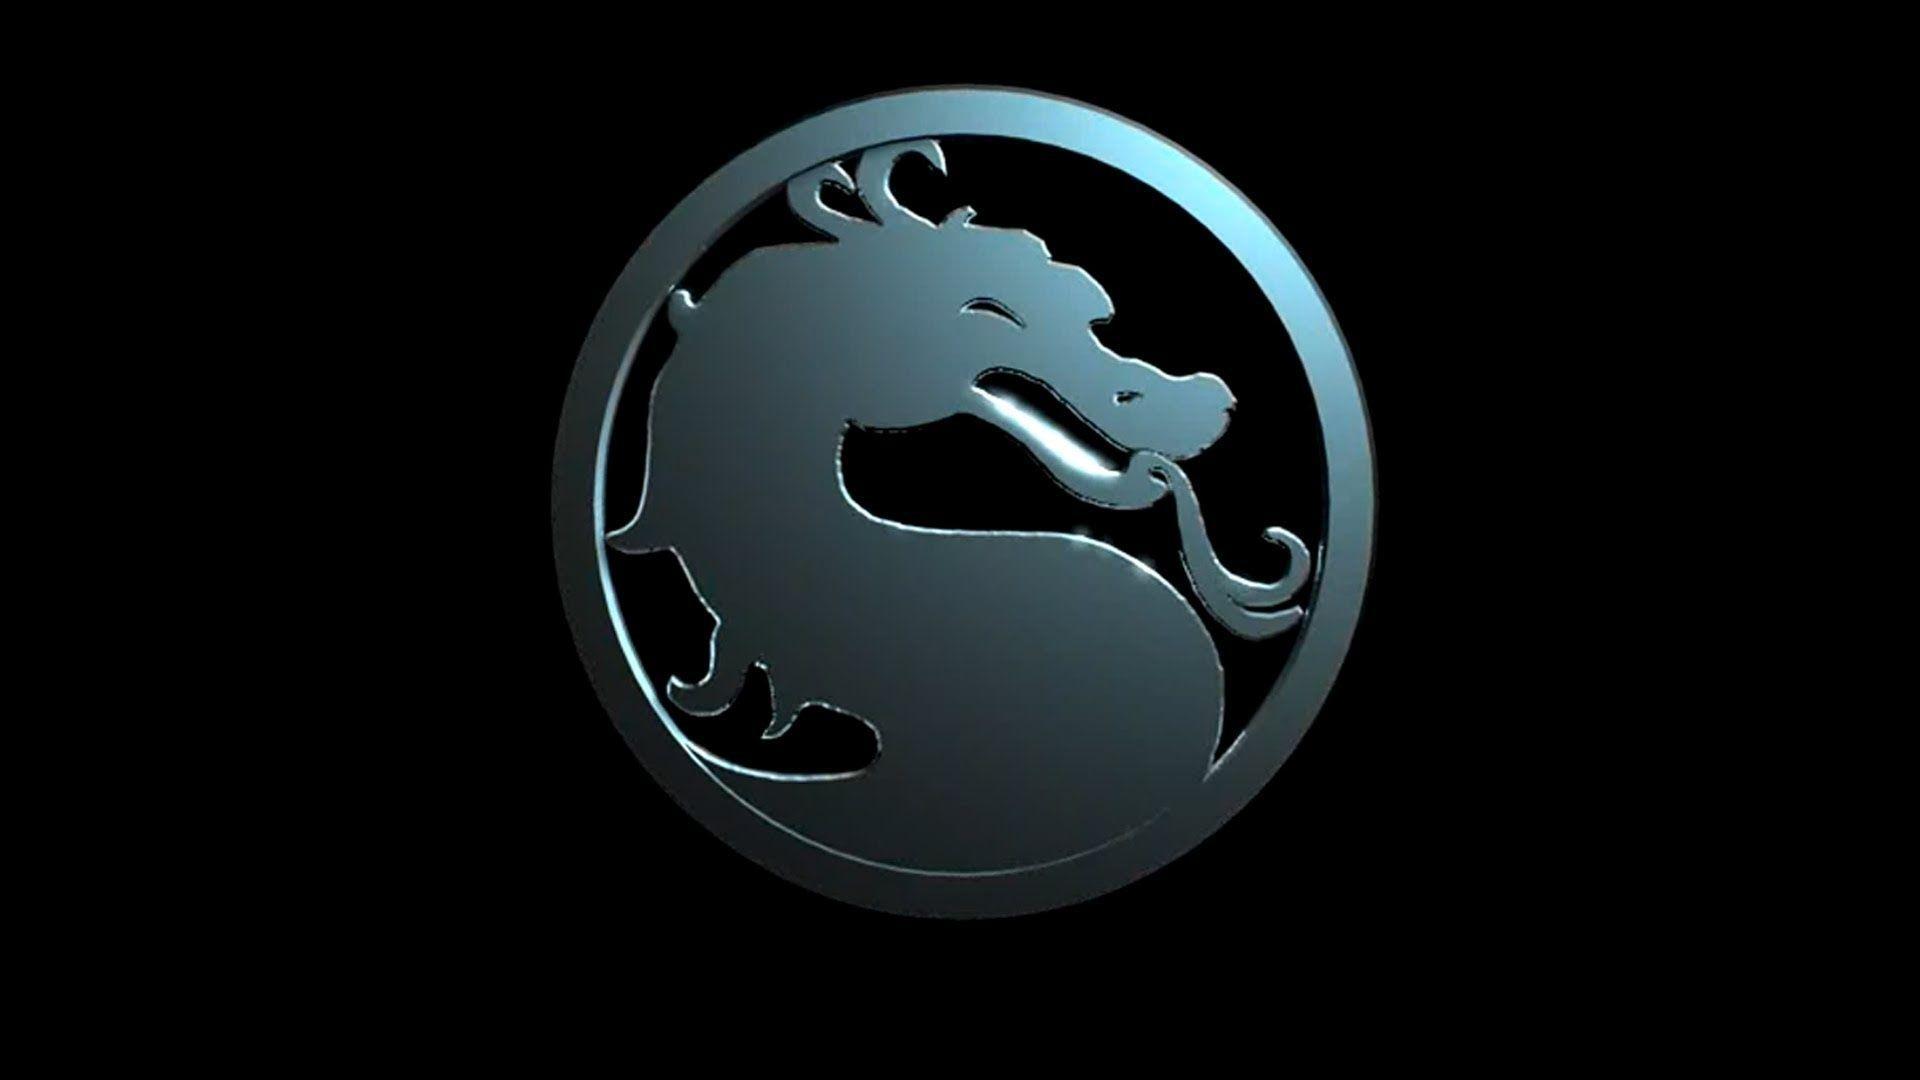 Mortal Kombat Logo Wallpapers - Wallpaper Cave